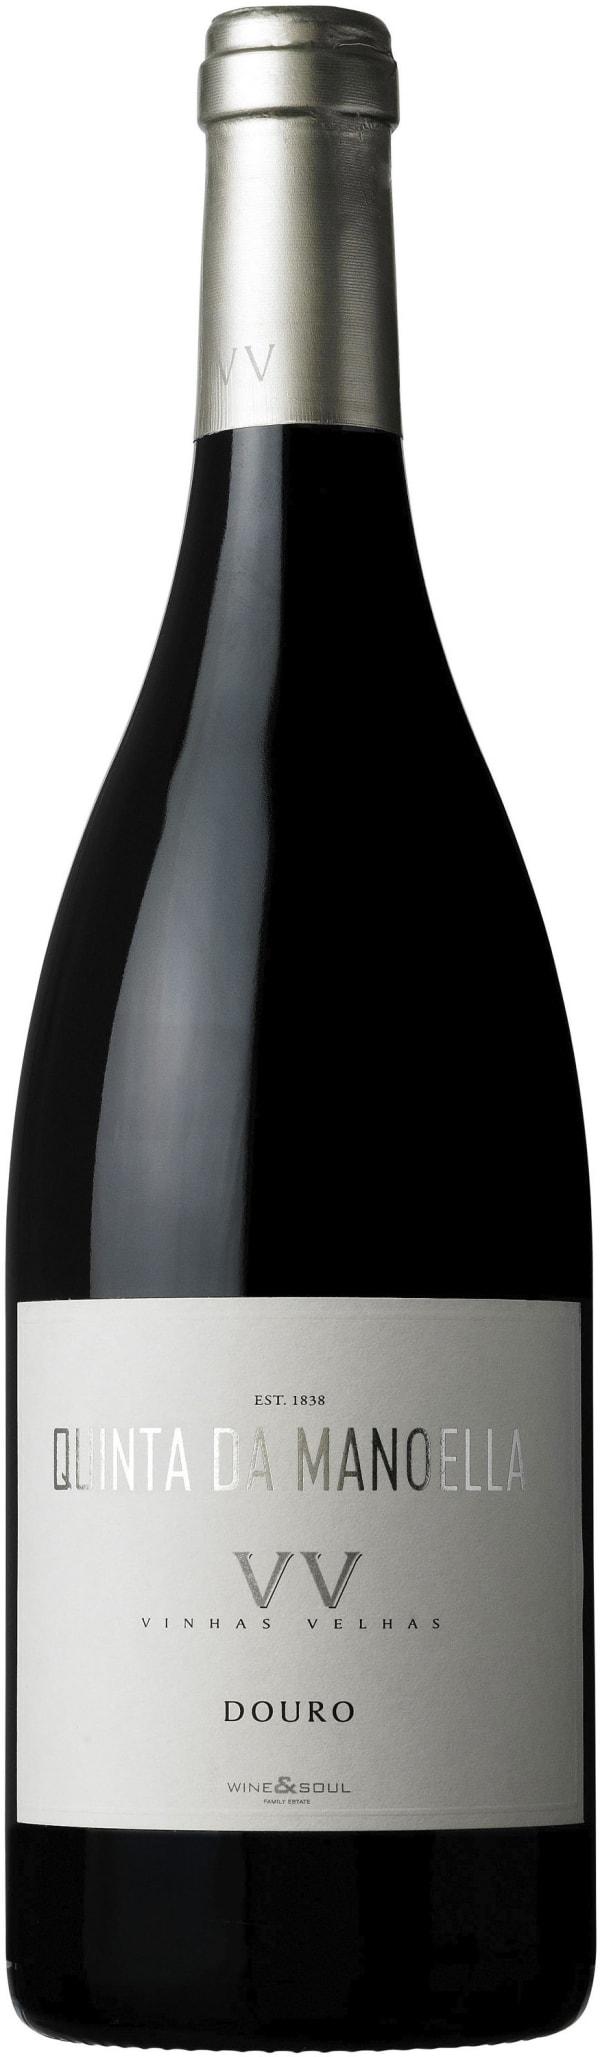 Wine & Soul Quinta da Manoella Vinhas Velhas 2015